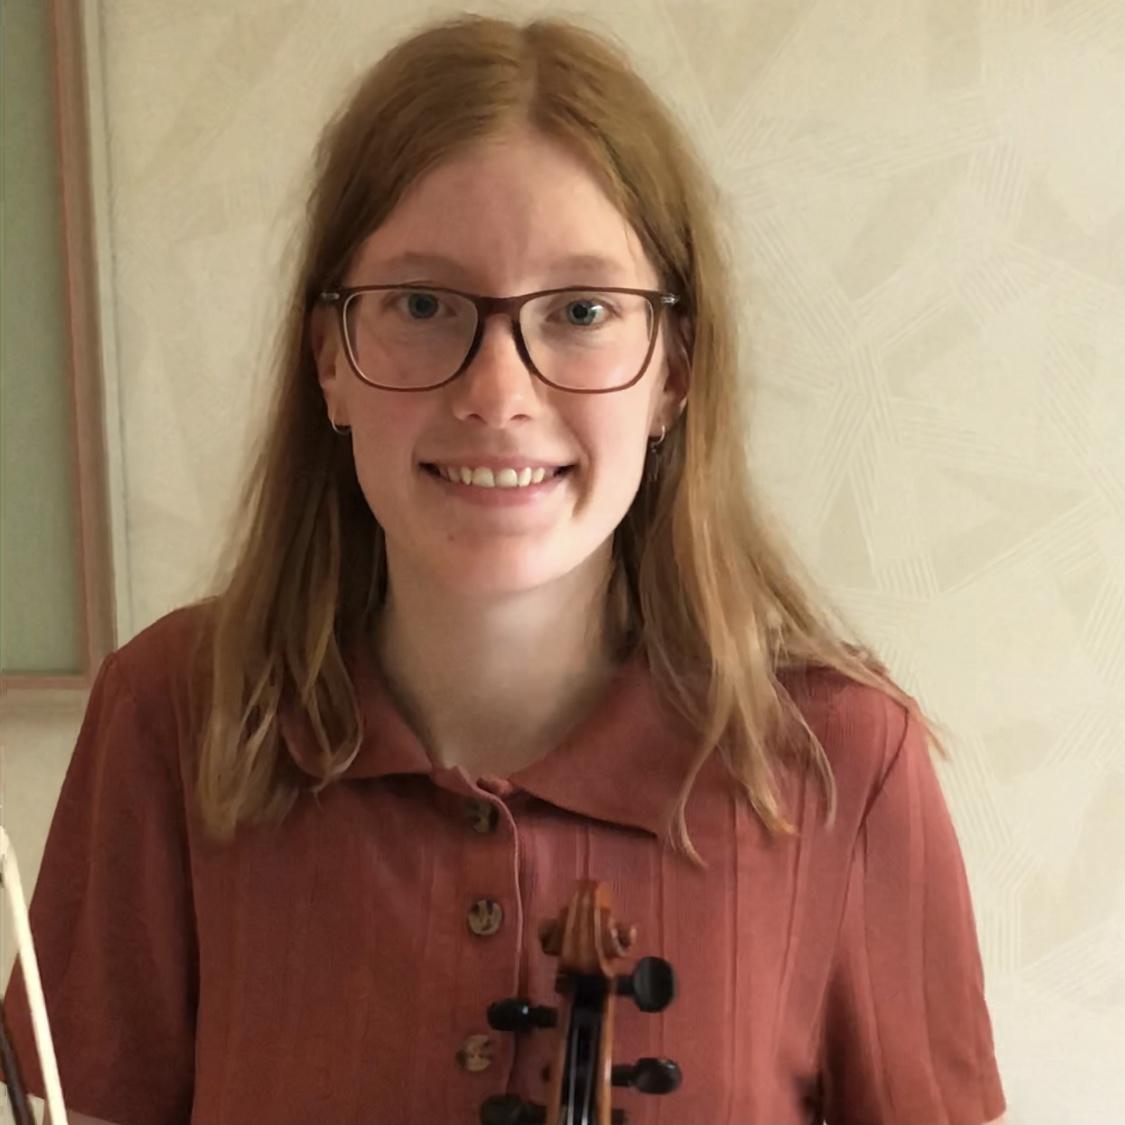 Renée vertelt waarom ze viool speelt